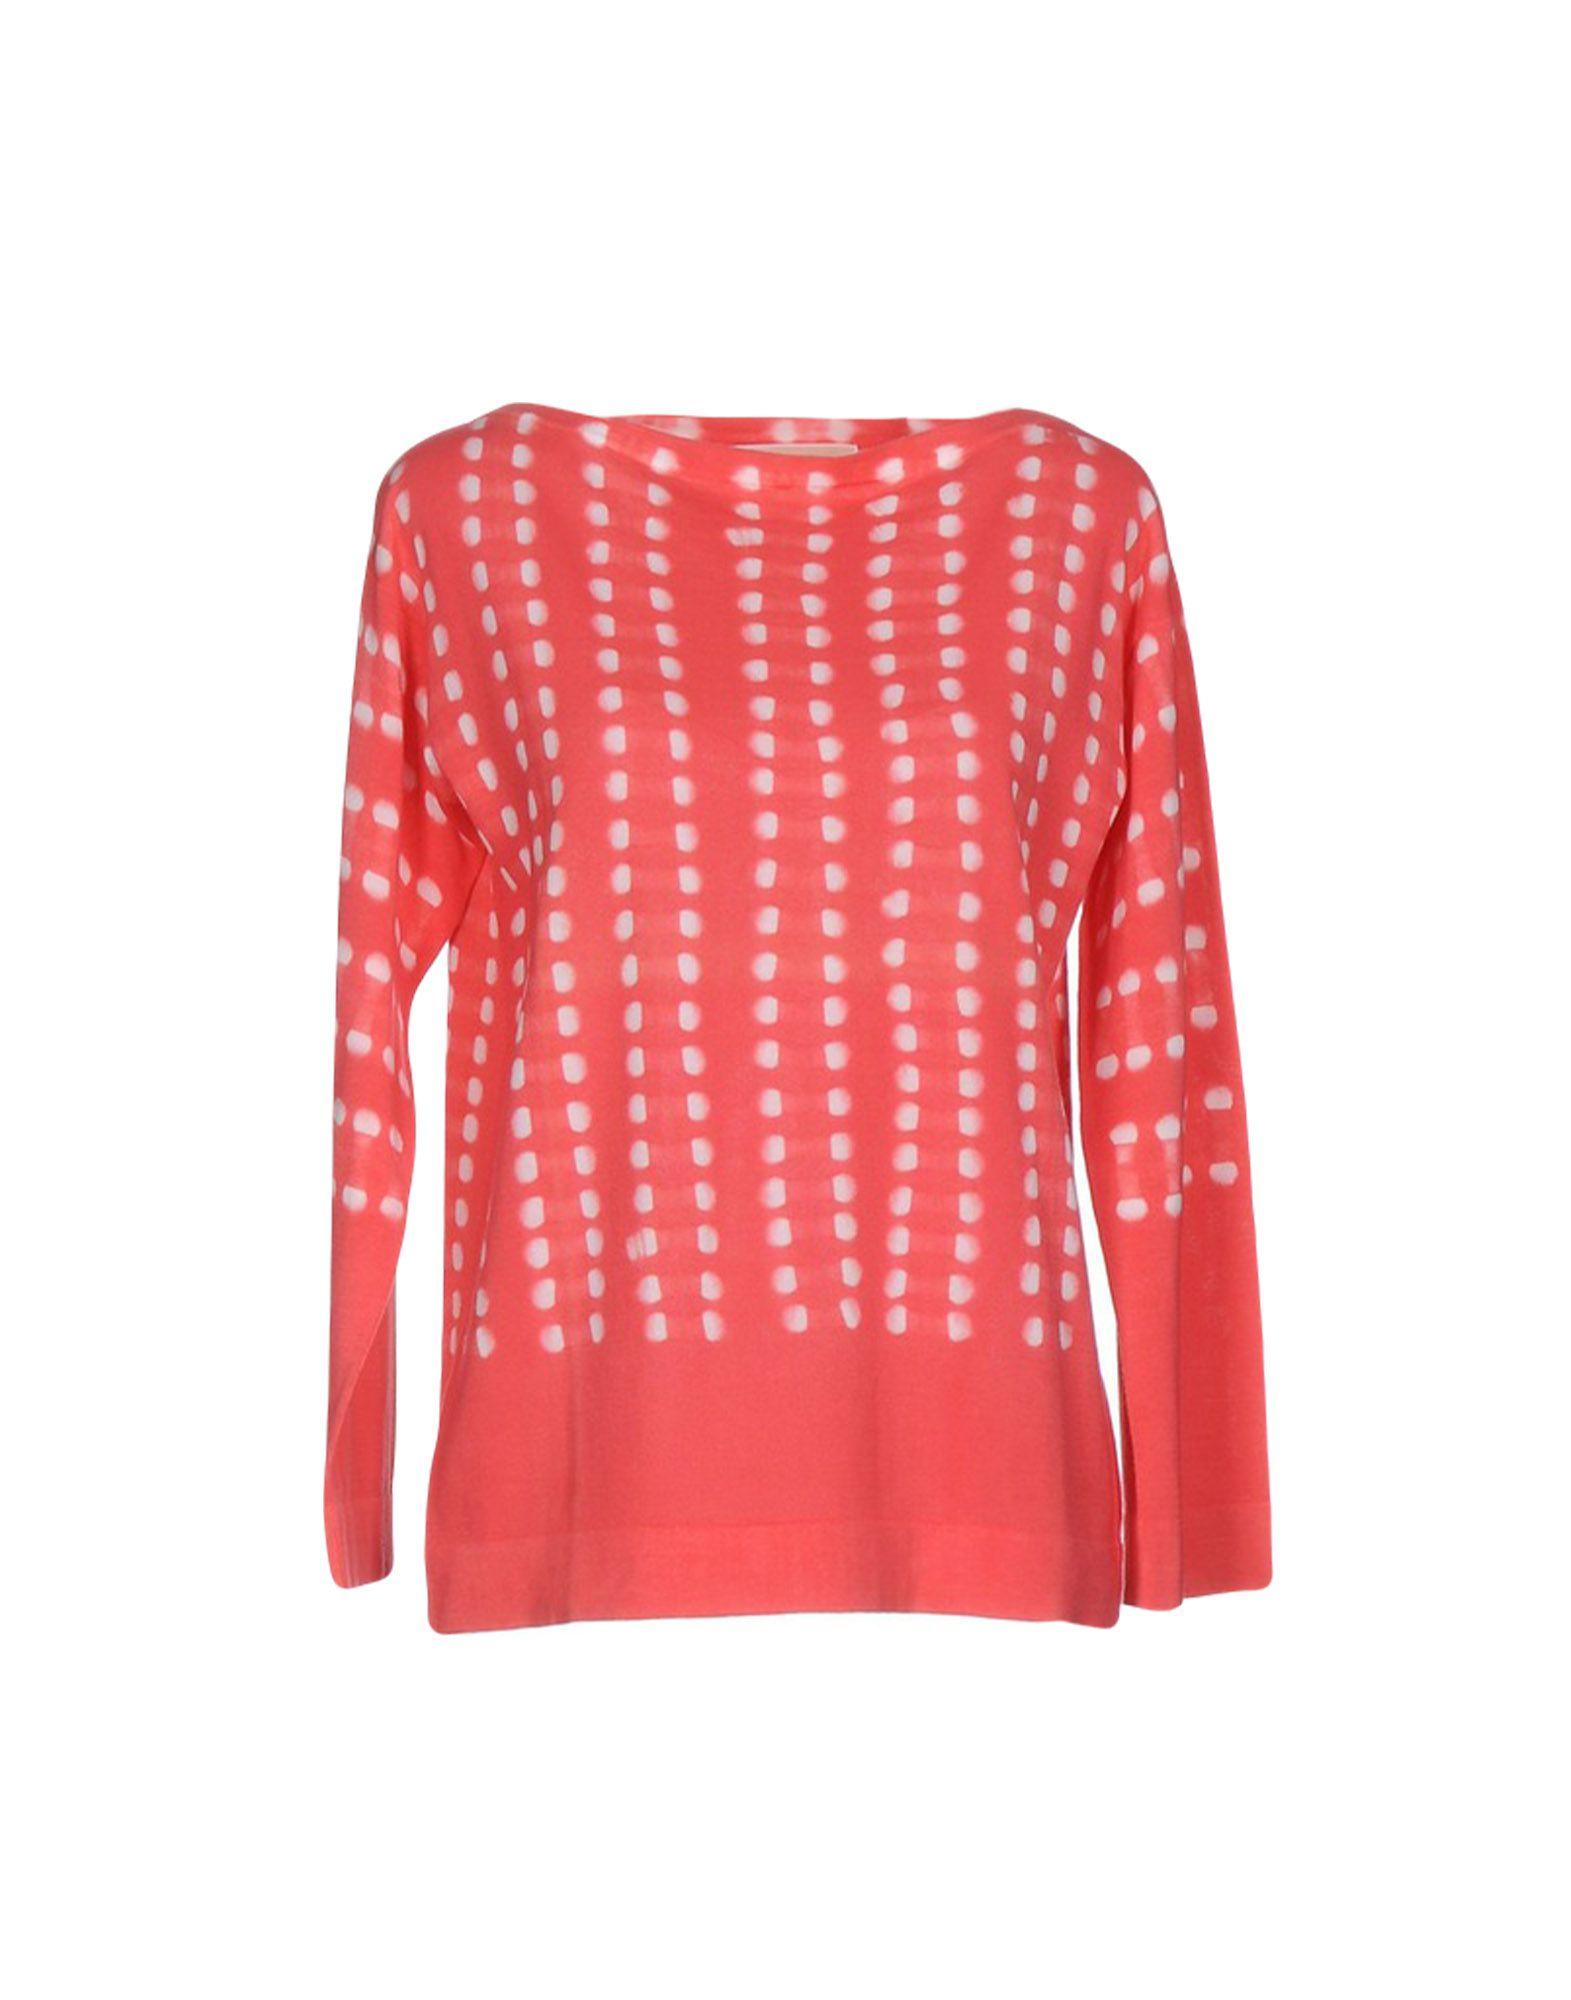 michael kors female michael kors sweaters